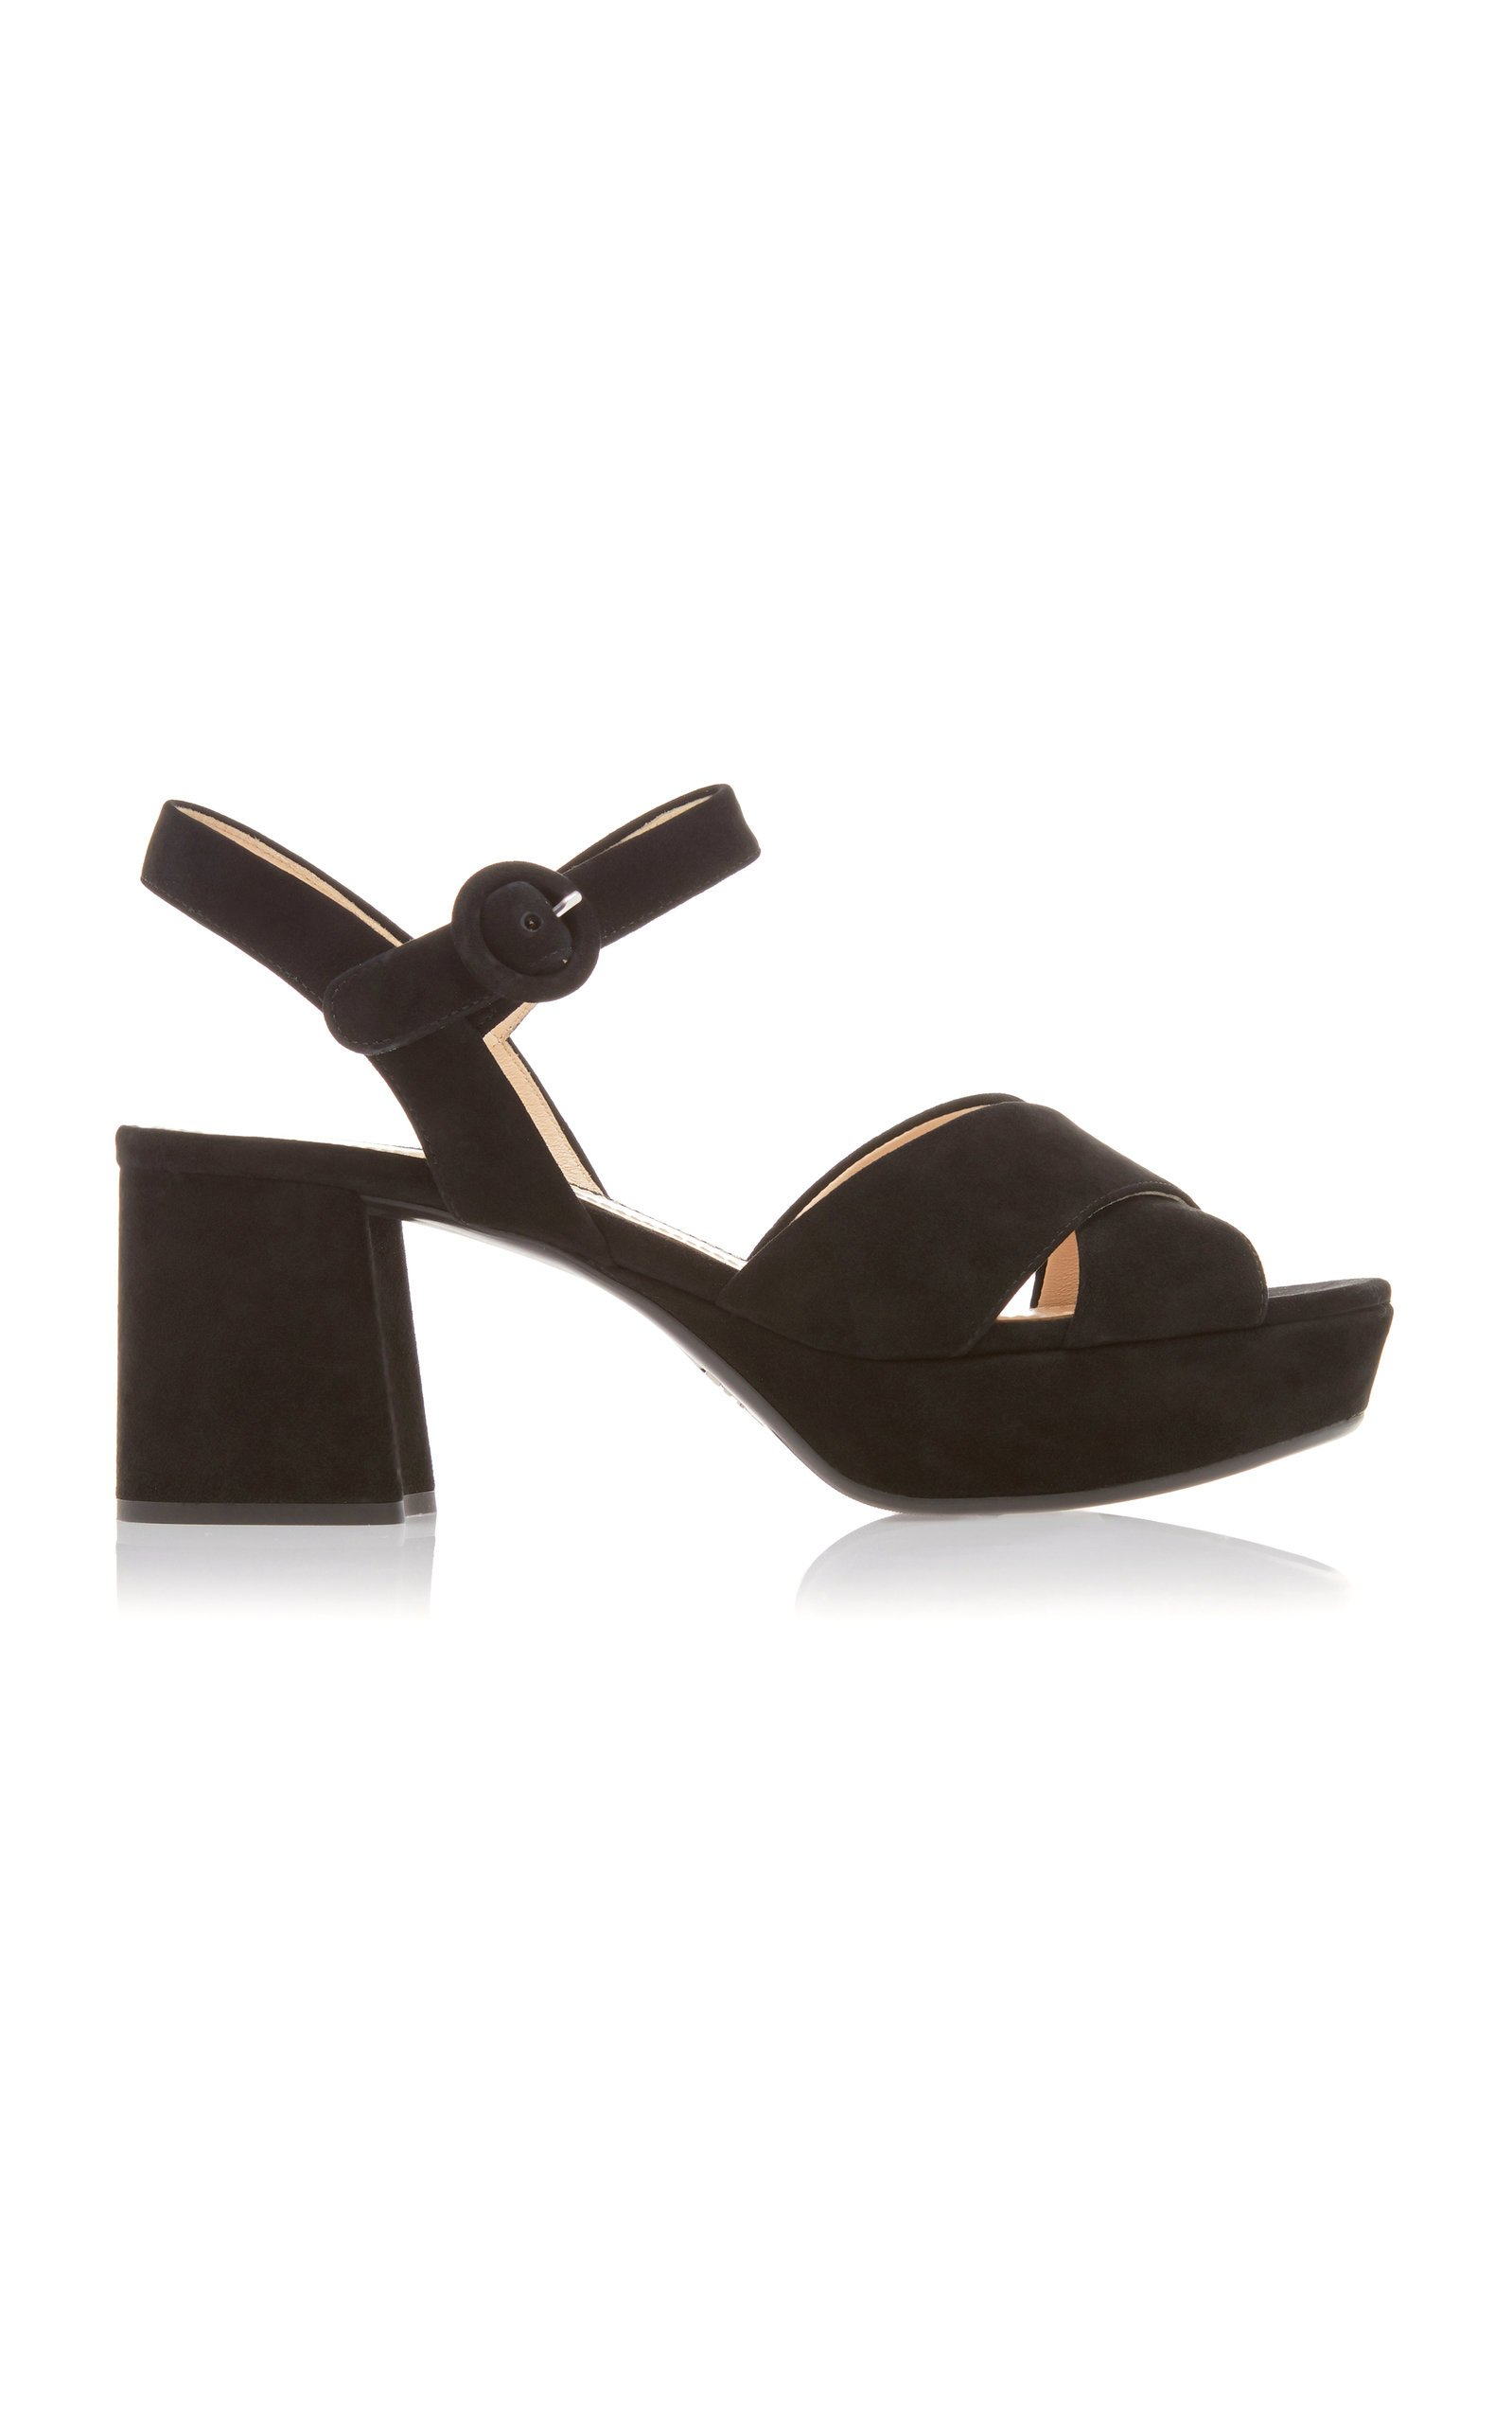 Suede Platform Sandals By Prada | Moda